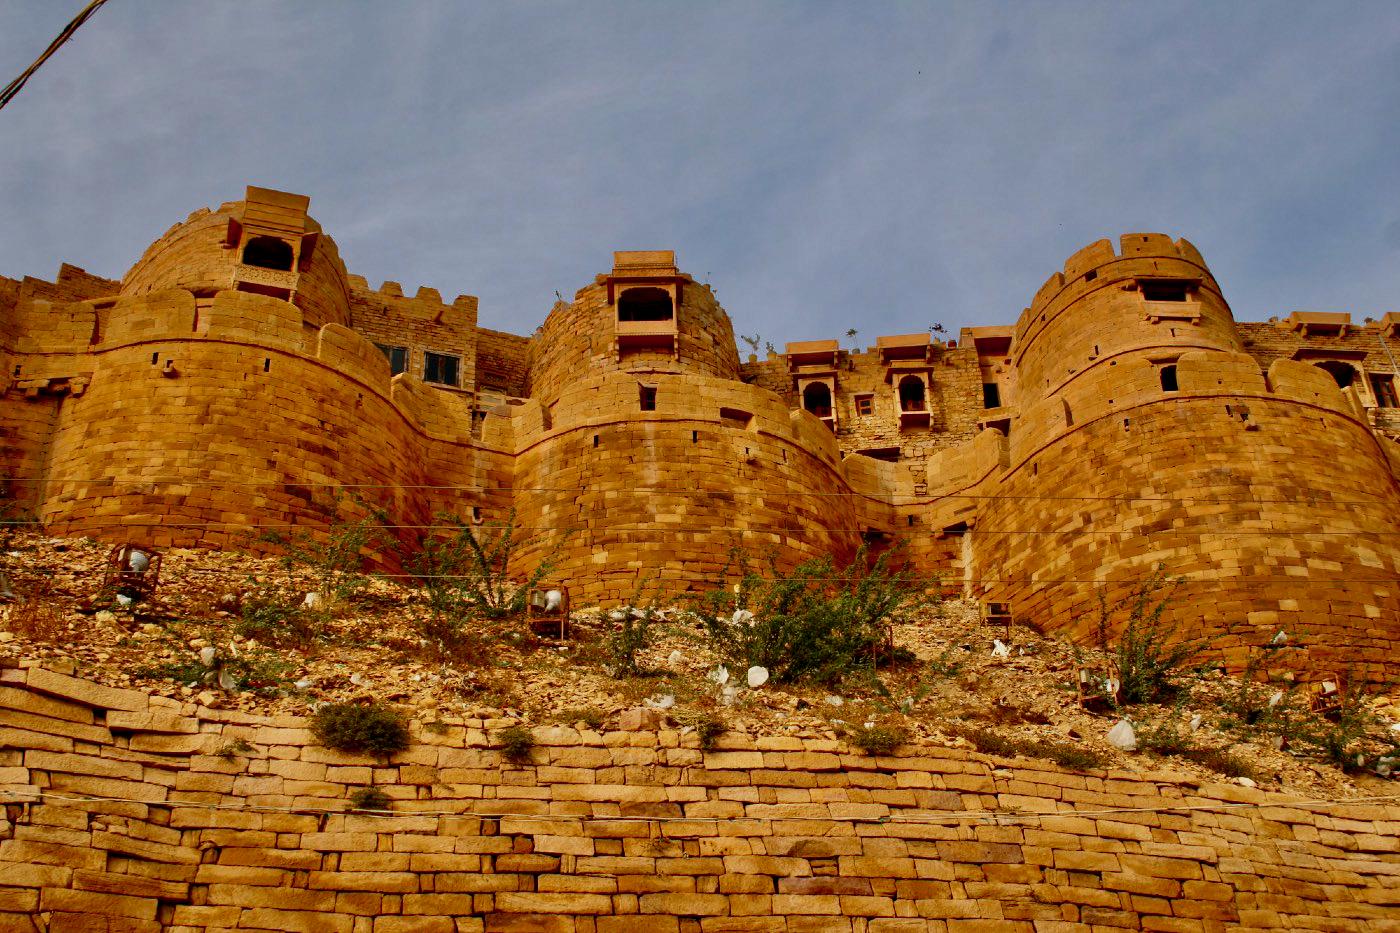 Jaisalmer Fort The Golden City India